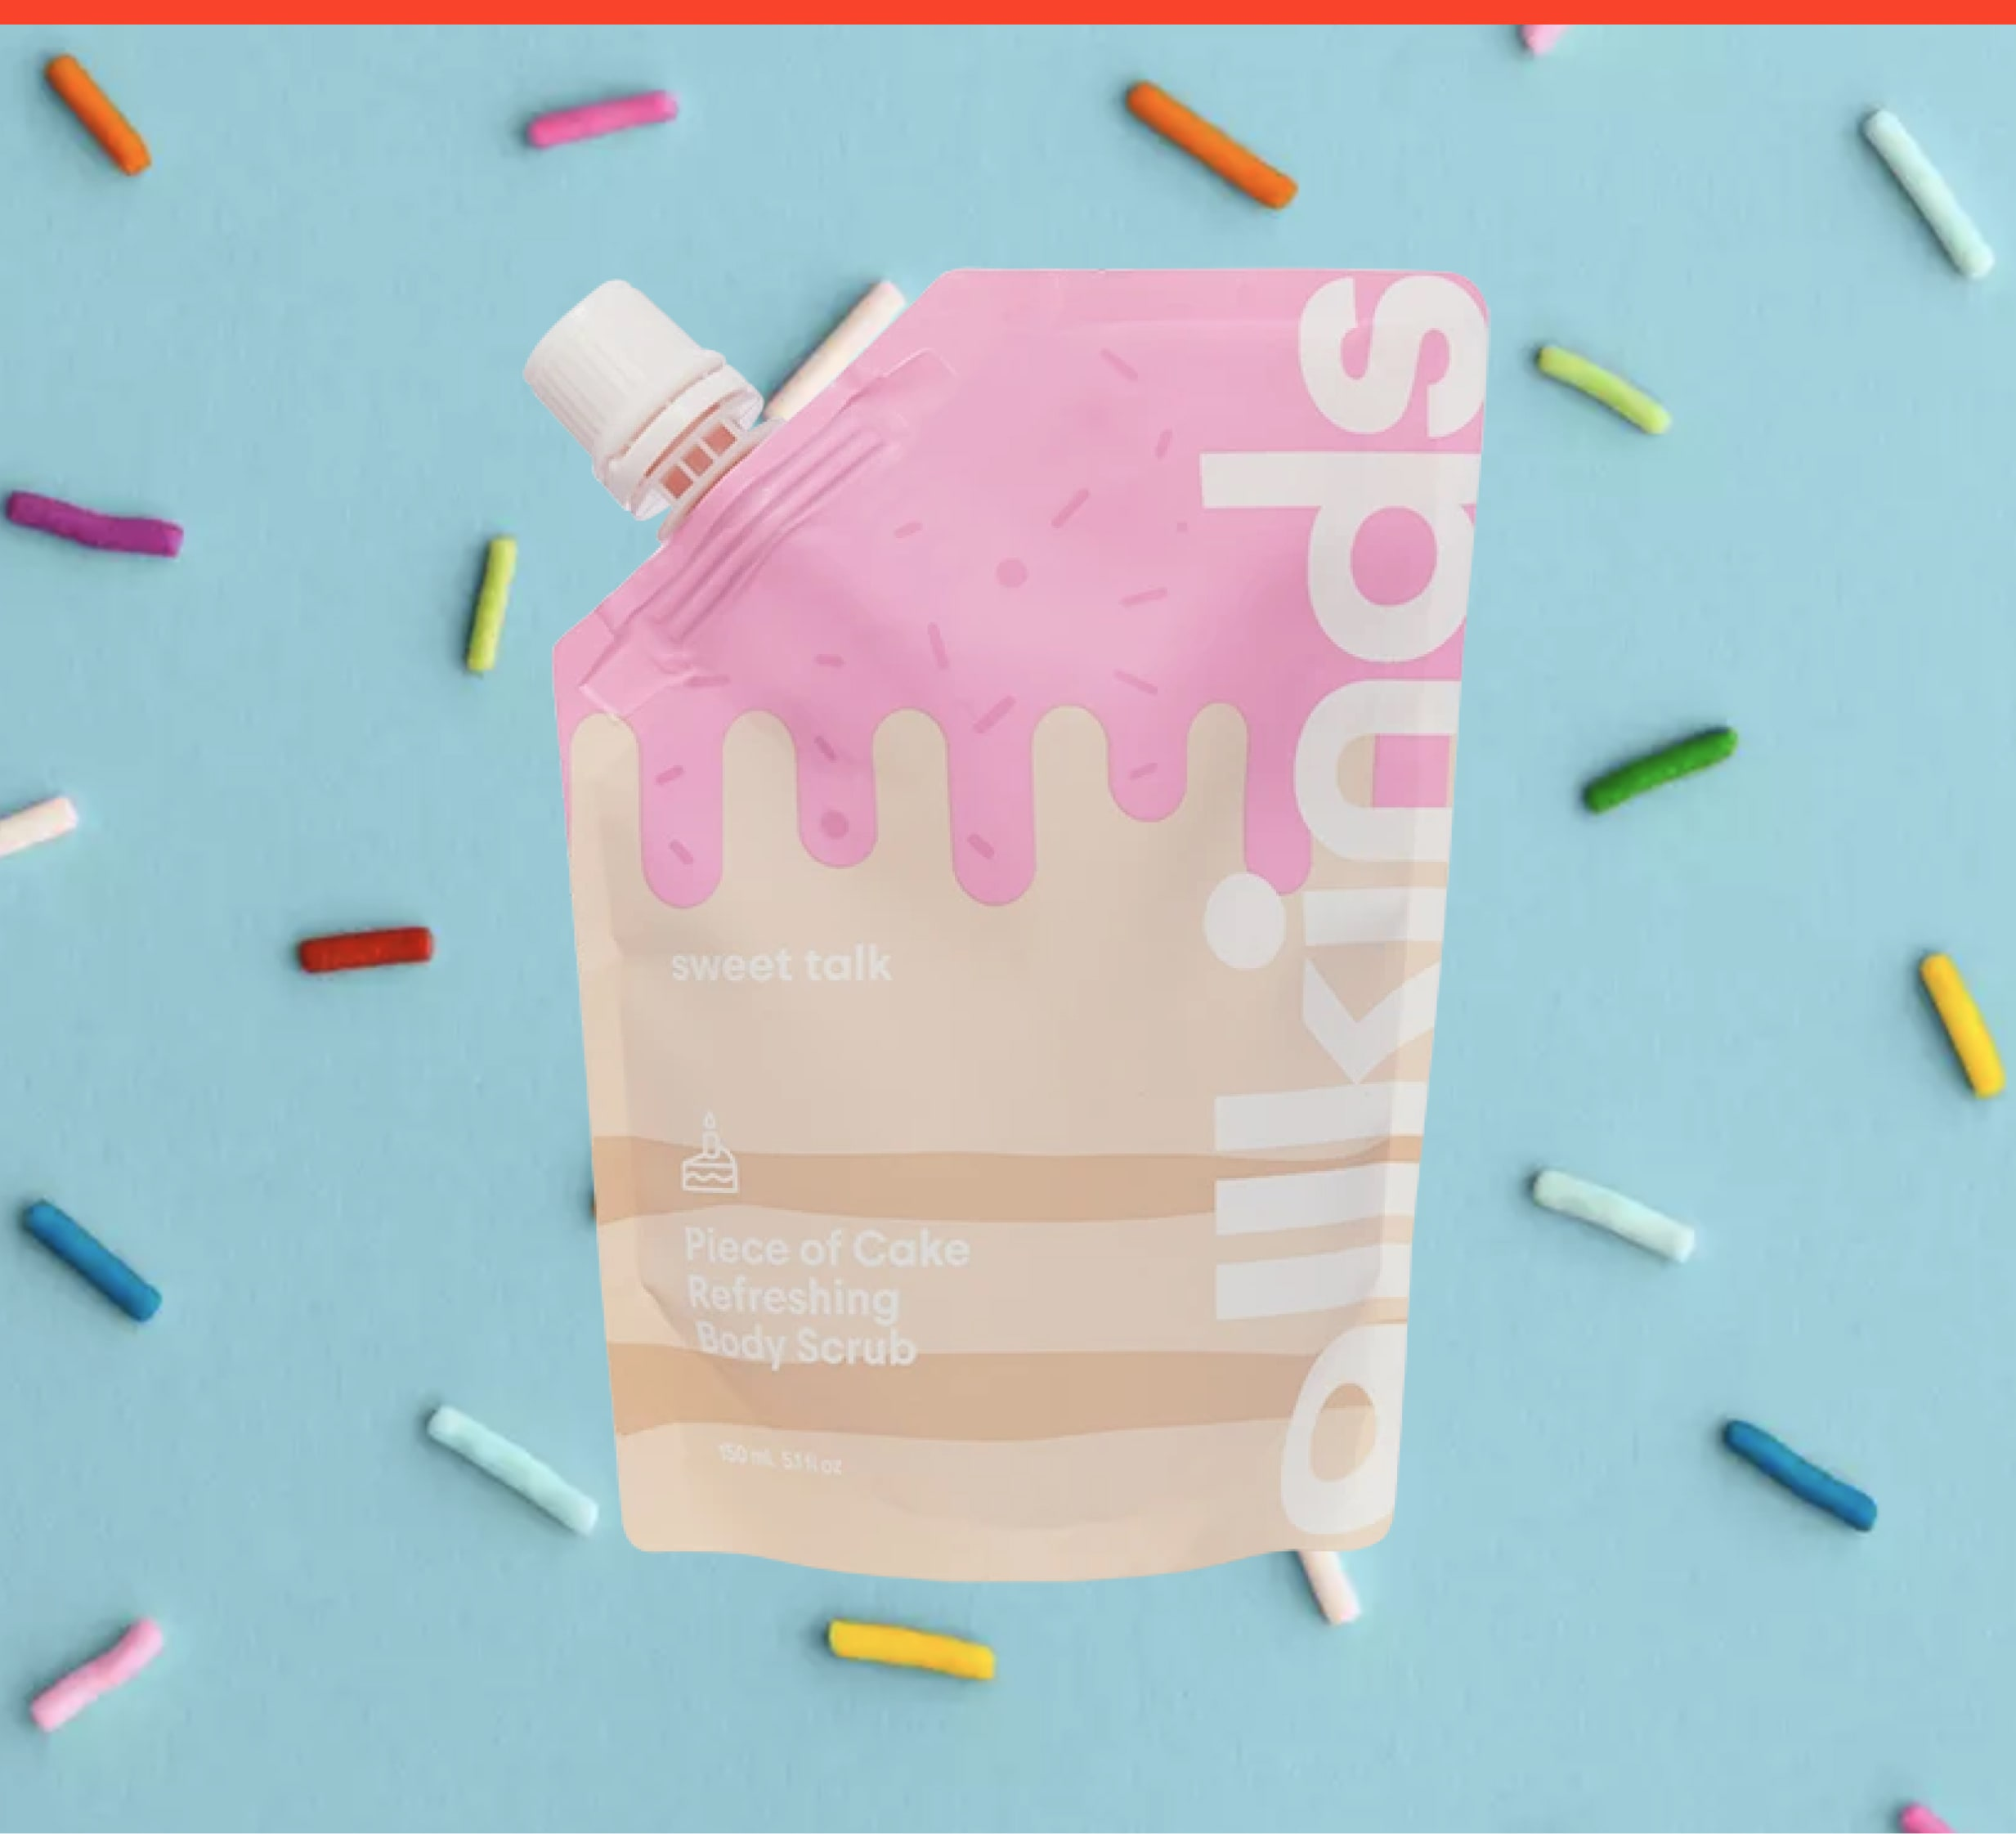 Sweet Talk Piece of Cake Refreshing Body Scrub on a blue sprinkles background